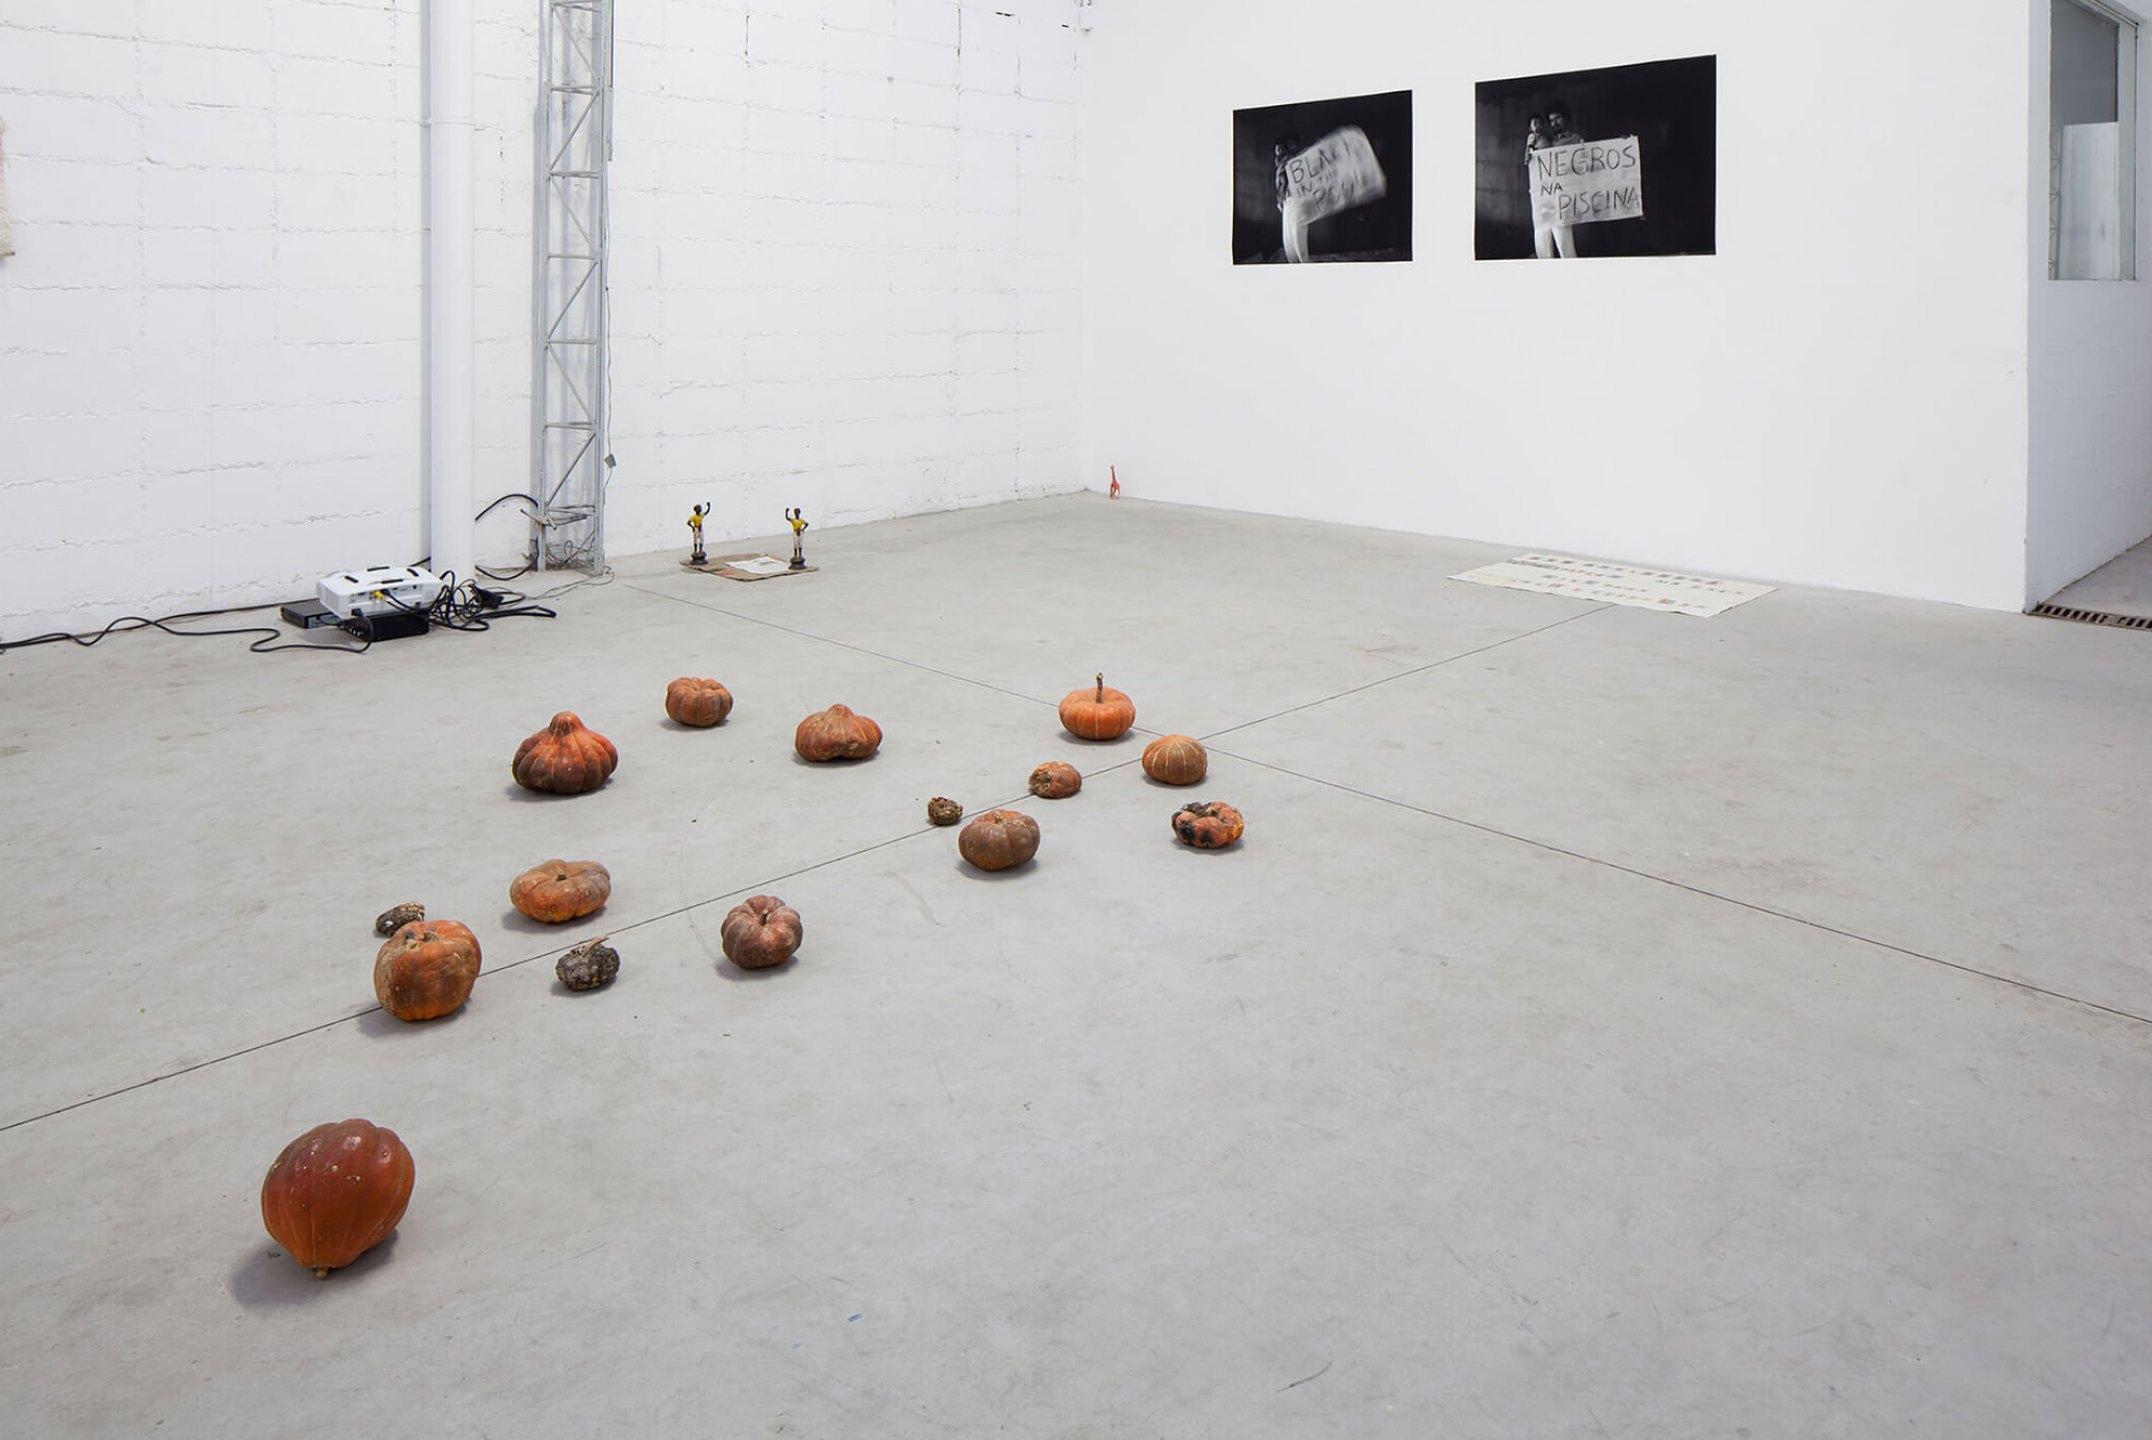 Paulo Nazareth,&nbsp;<em>Che Cherera</em>, Mendes Wood DM, São Paulo, 2014 - Mendes Wood DM